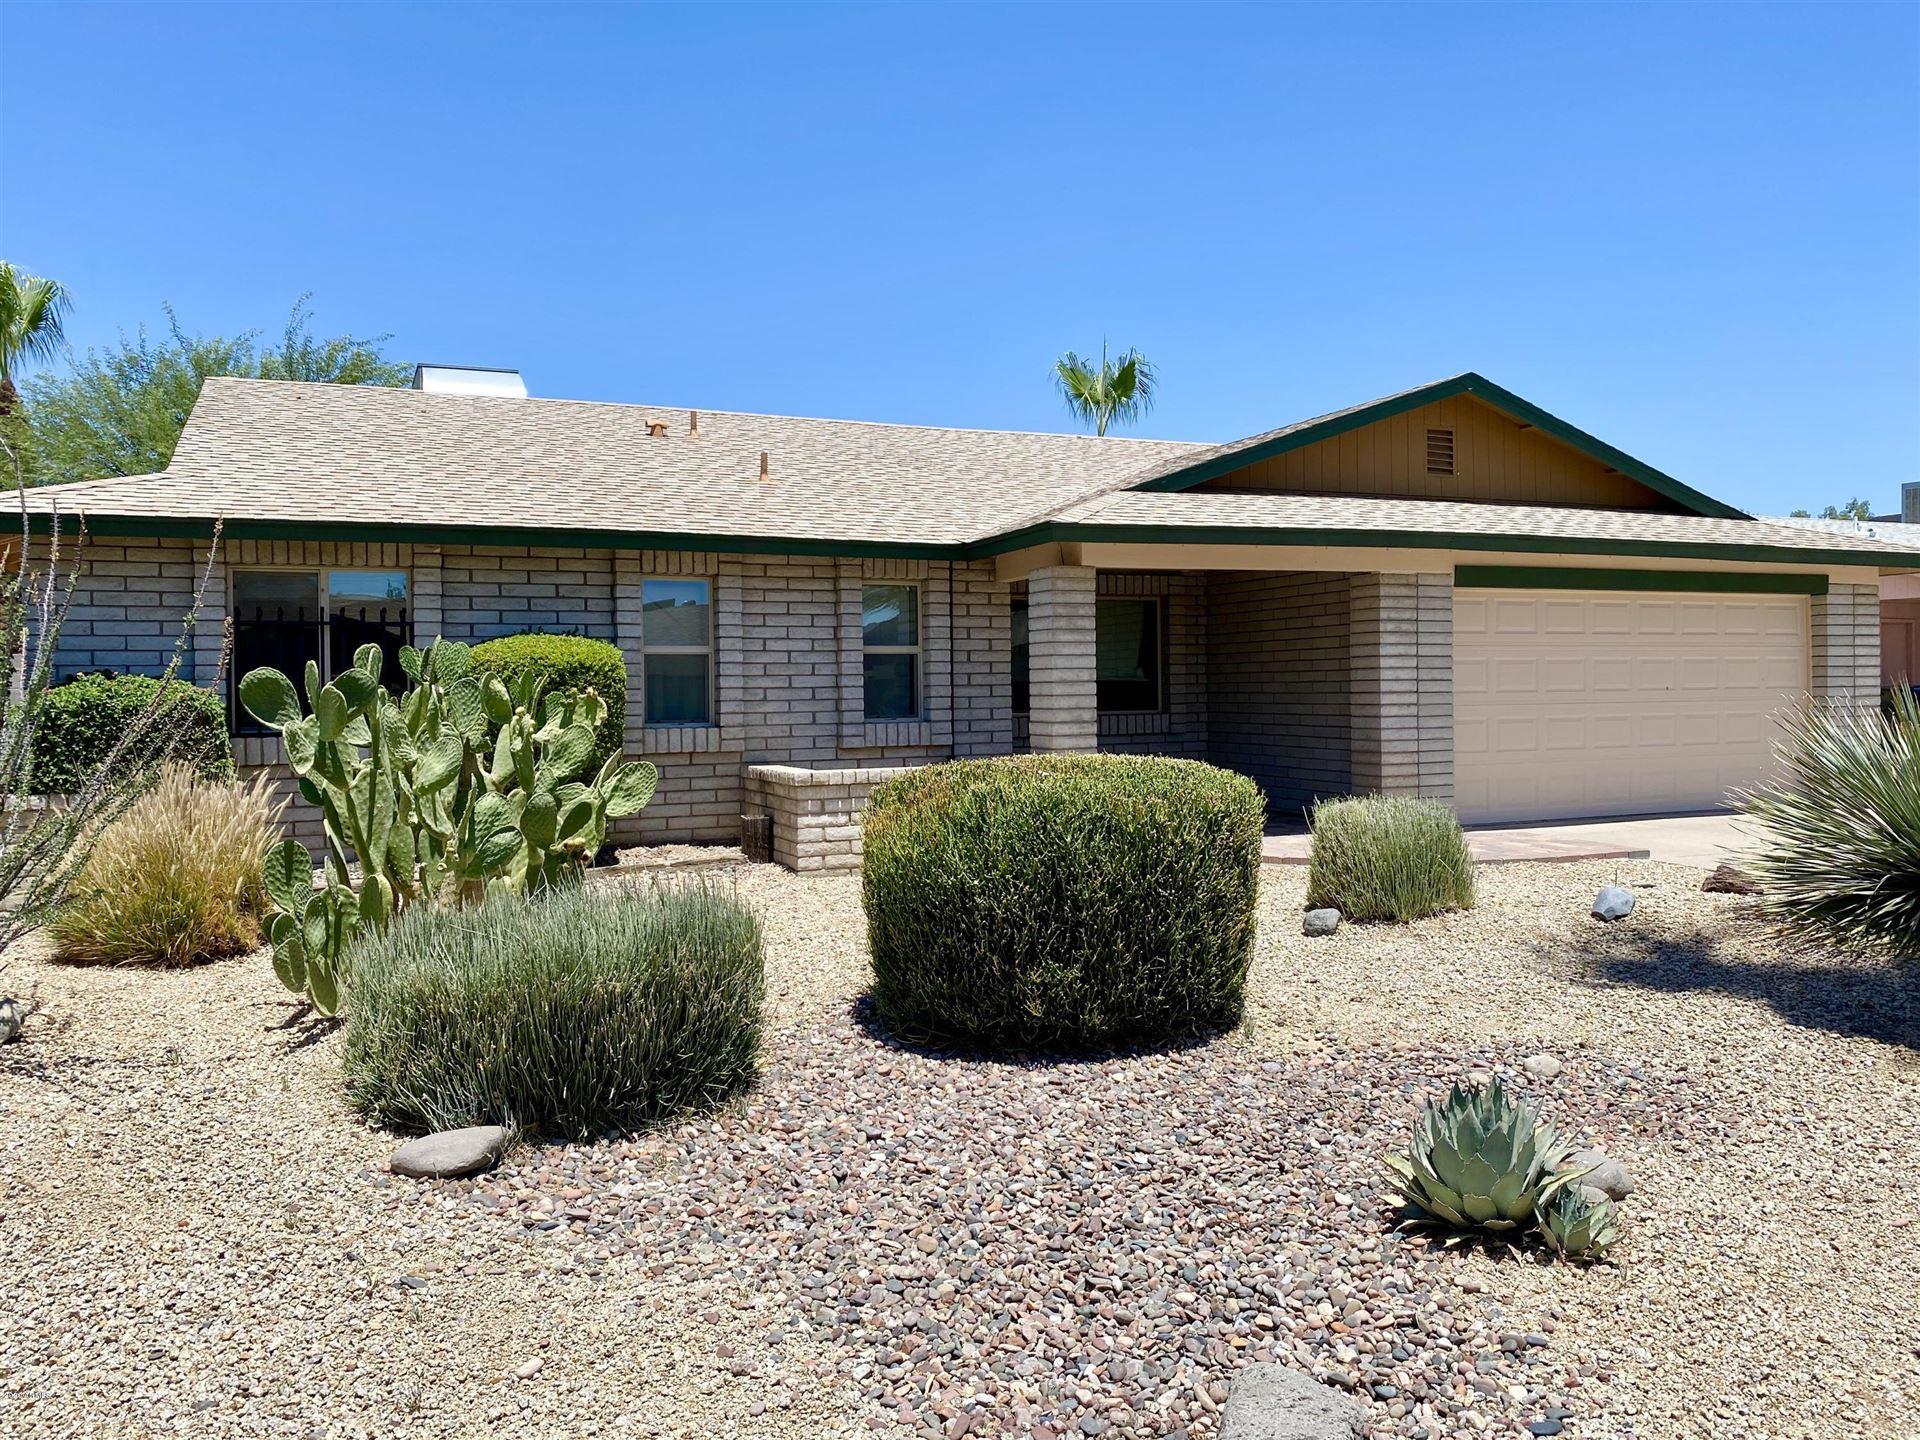 536 E MORROW Drive, Phoenix, AZ 85024 - #: 6101368